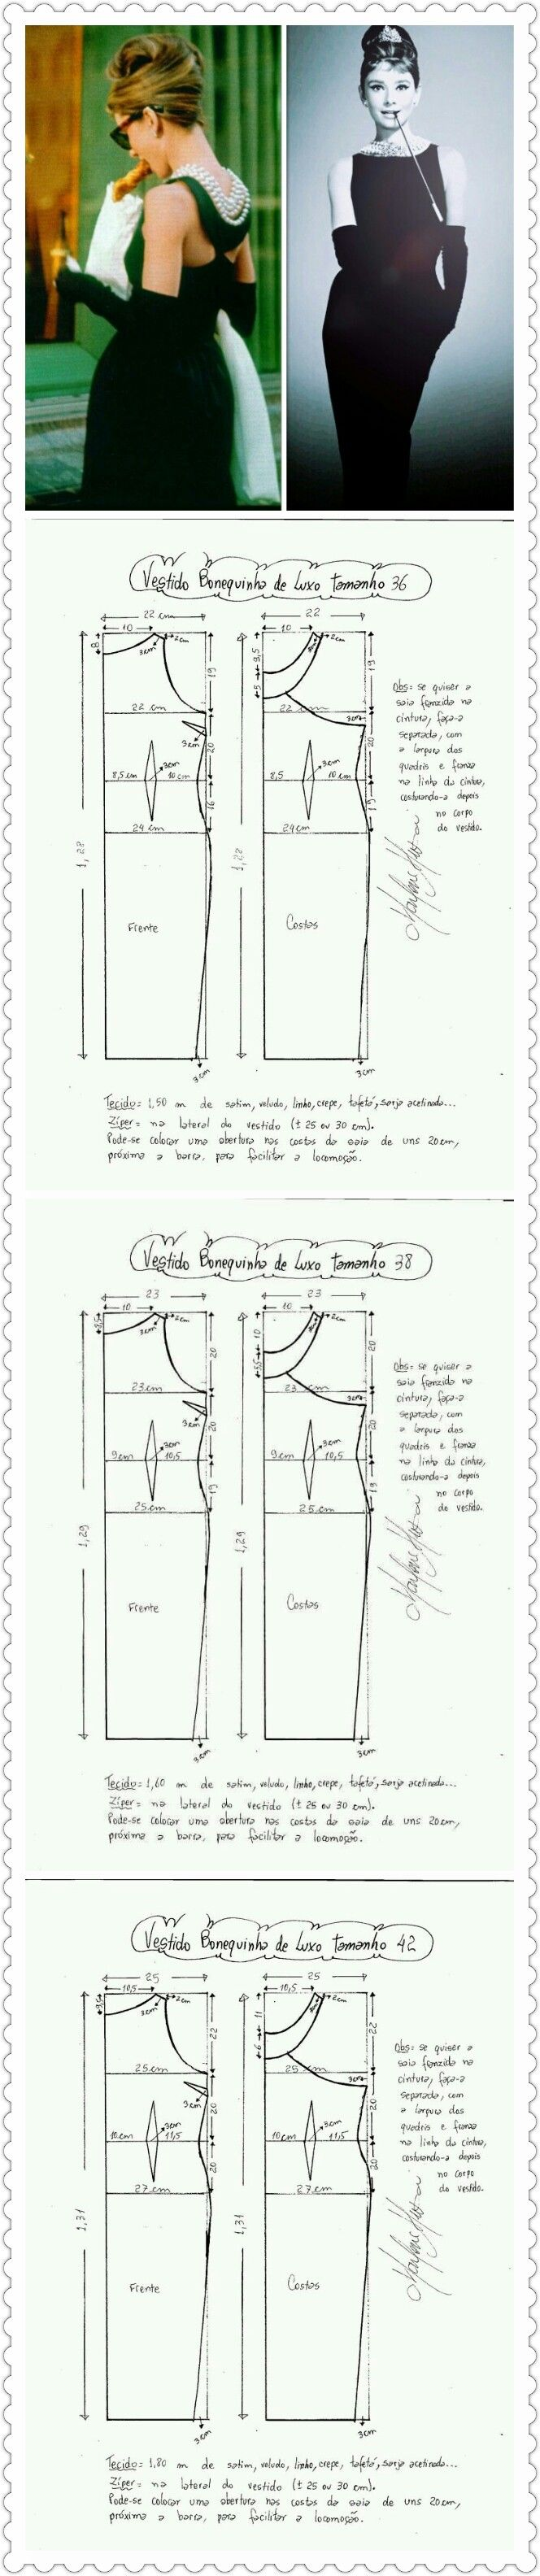 Pin von Sooyeon Cho auf sewing   Pinterest   Nähen, Schnittmuster ...